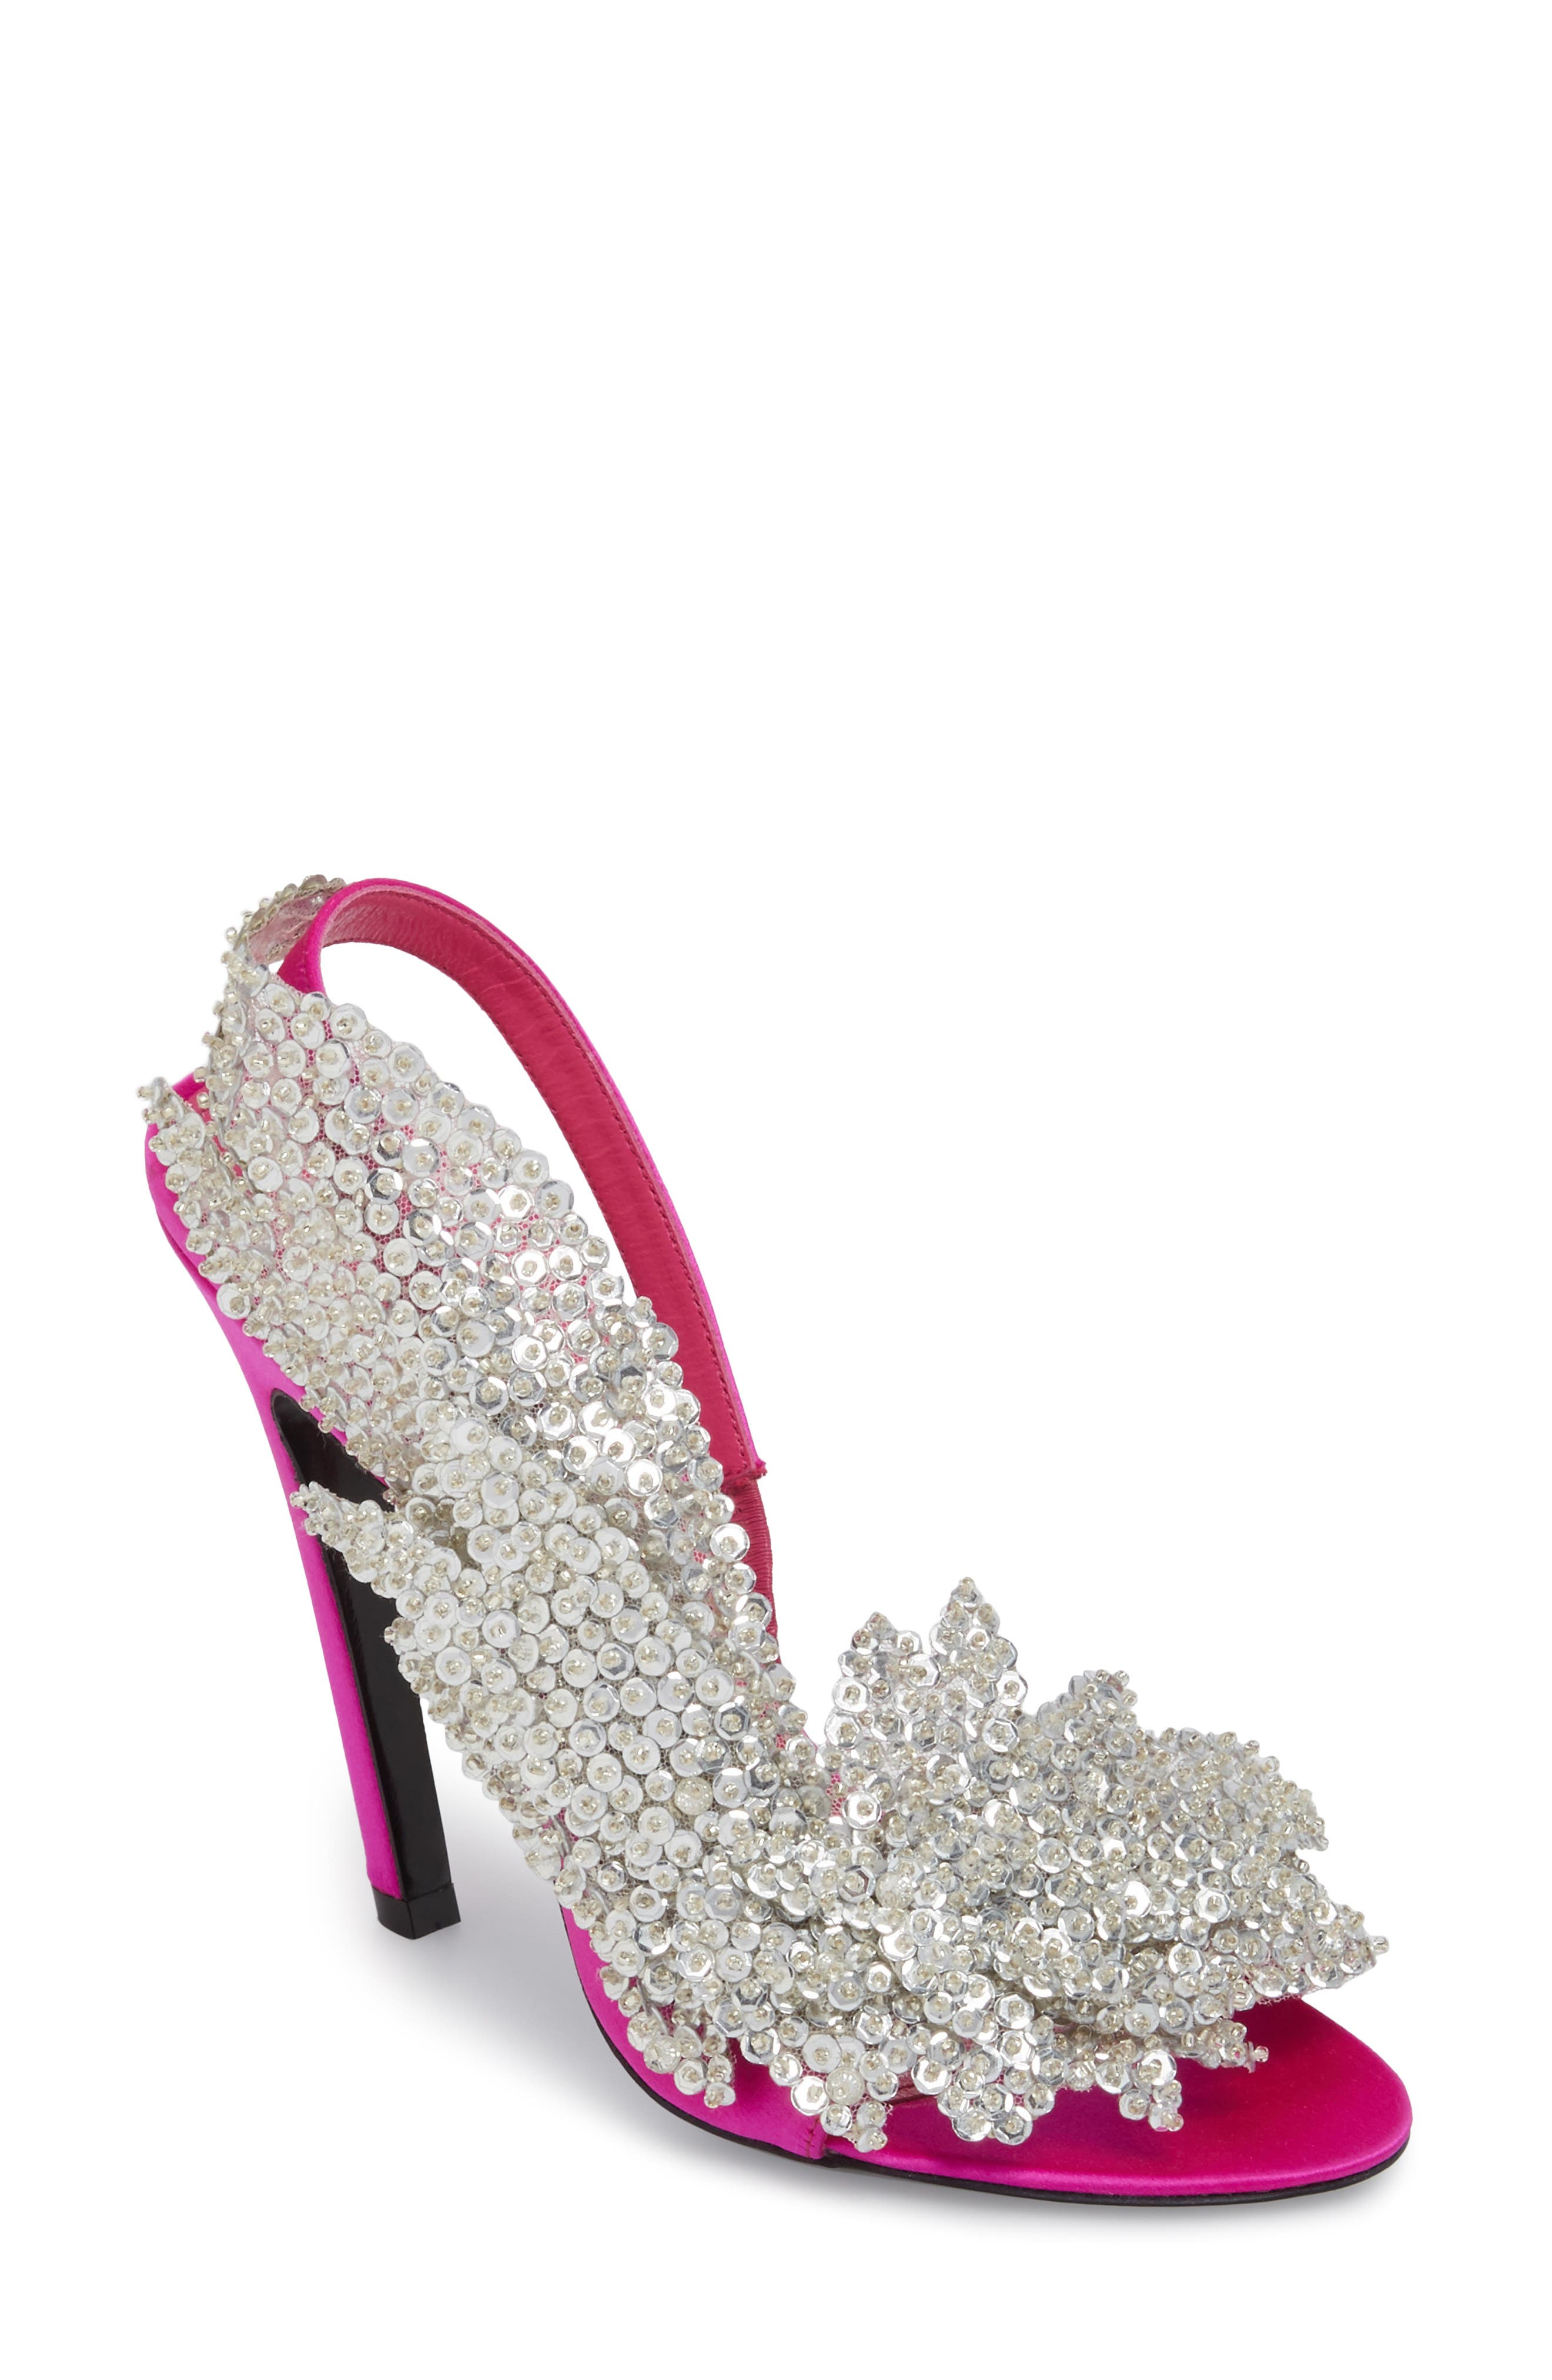 Embellished Slingback Sandal,                         Main,                         color, Rose Fuchsia/ Crystal